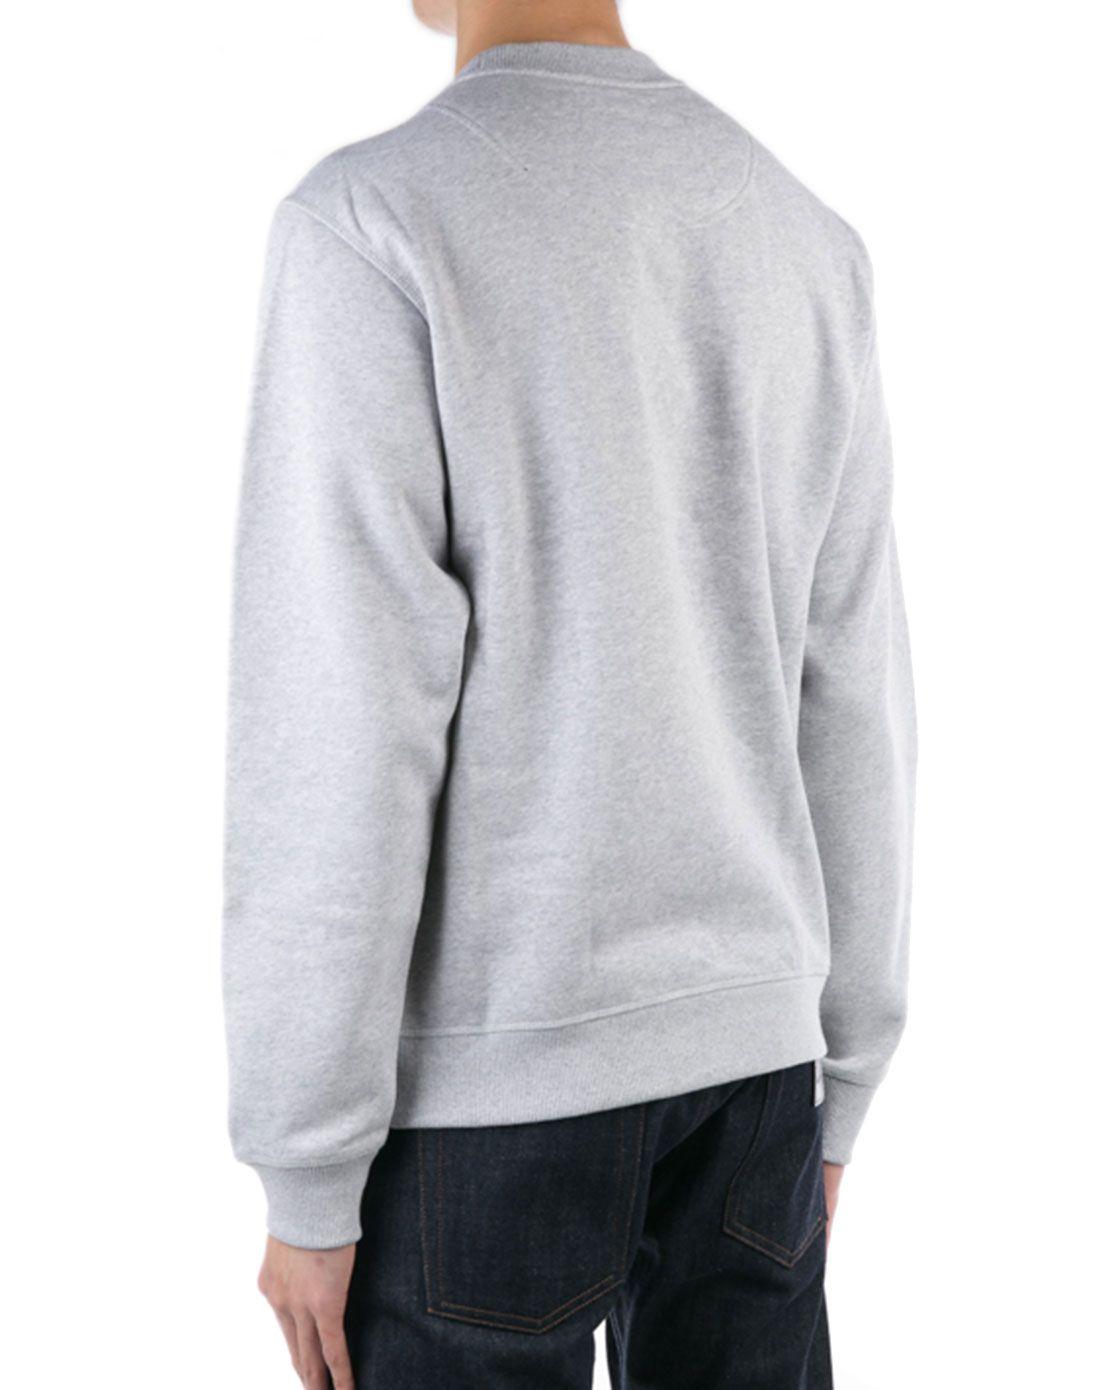 > kenzo灰色树形图案时尚卫衣图片